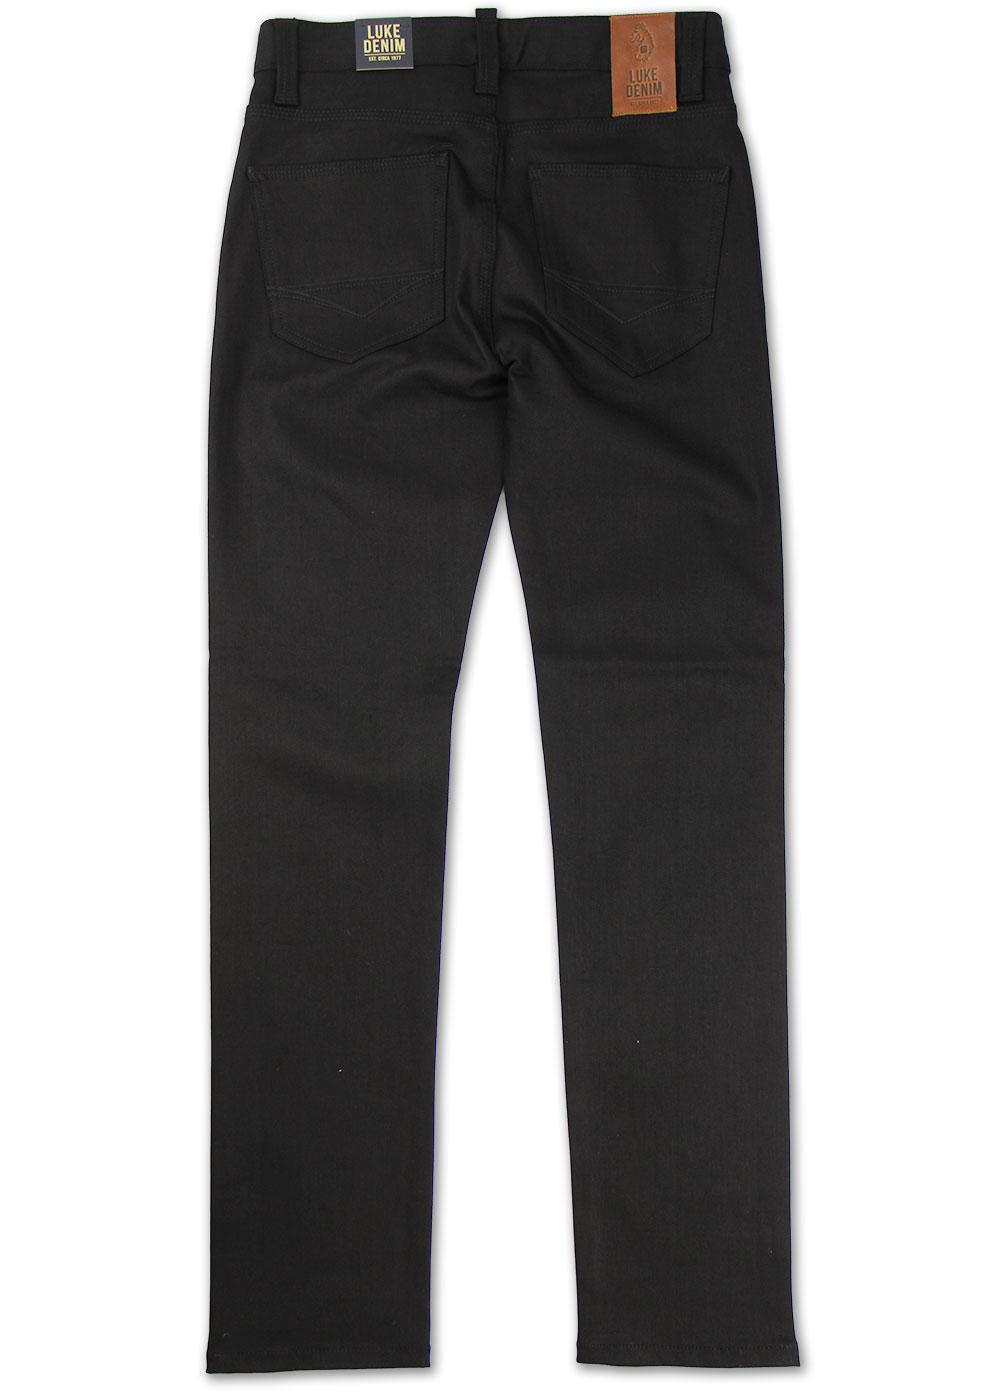 27306675b Rui LUKE 1977 Retro Indie Mod Skinny Black Jeans